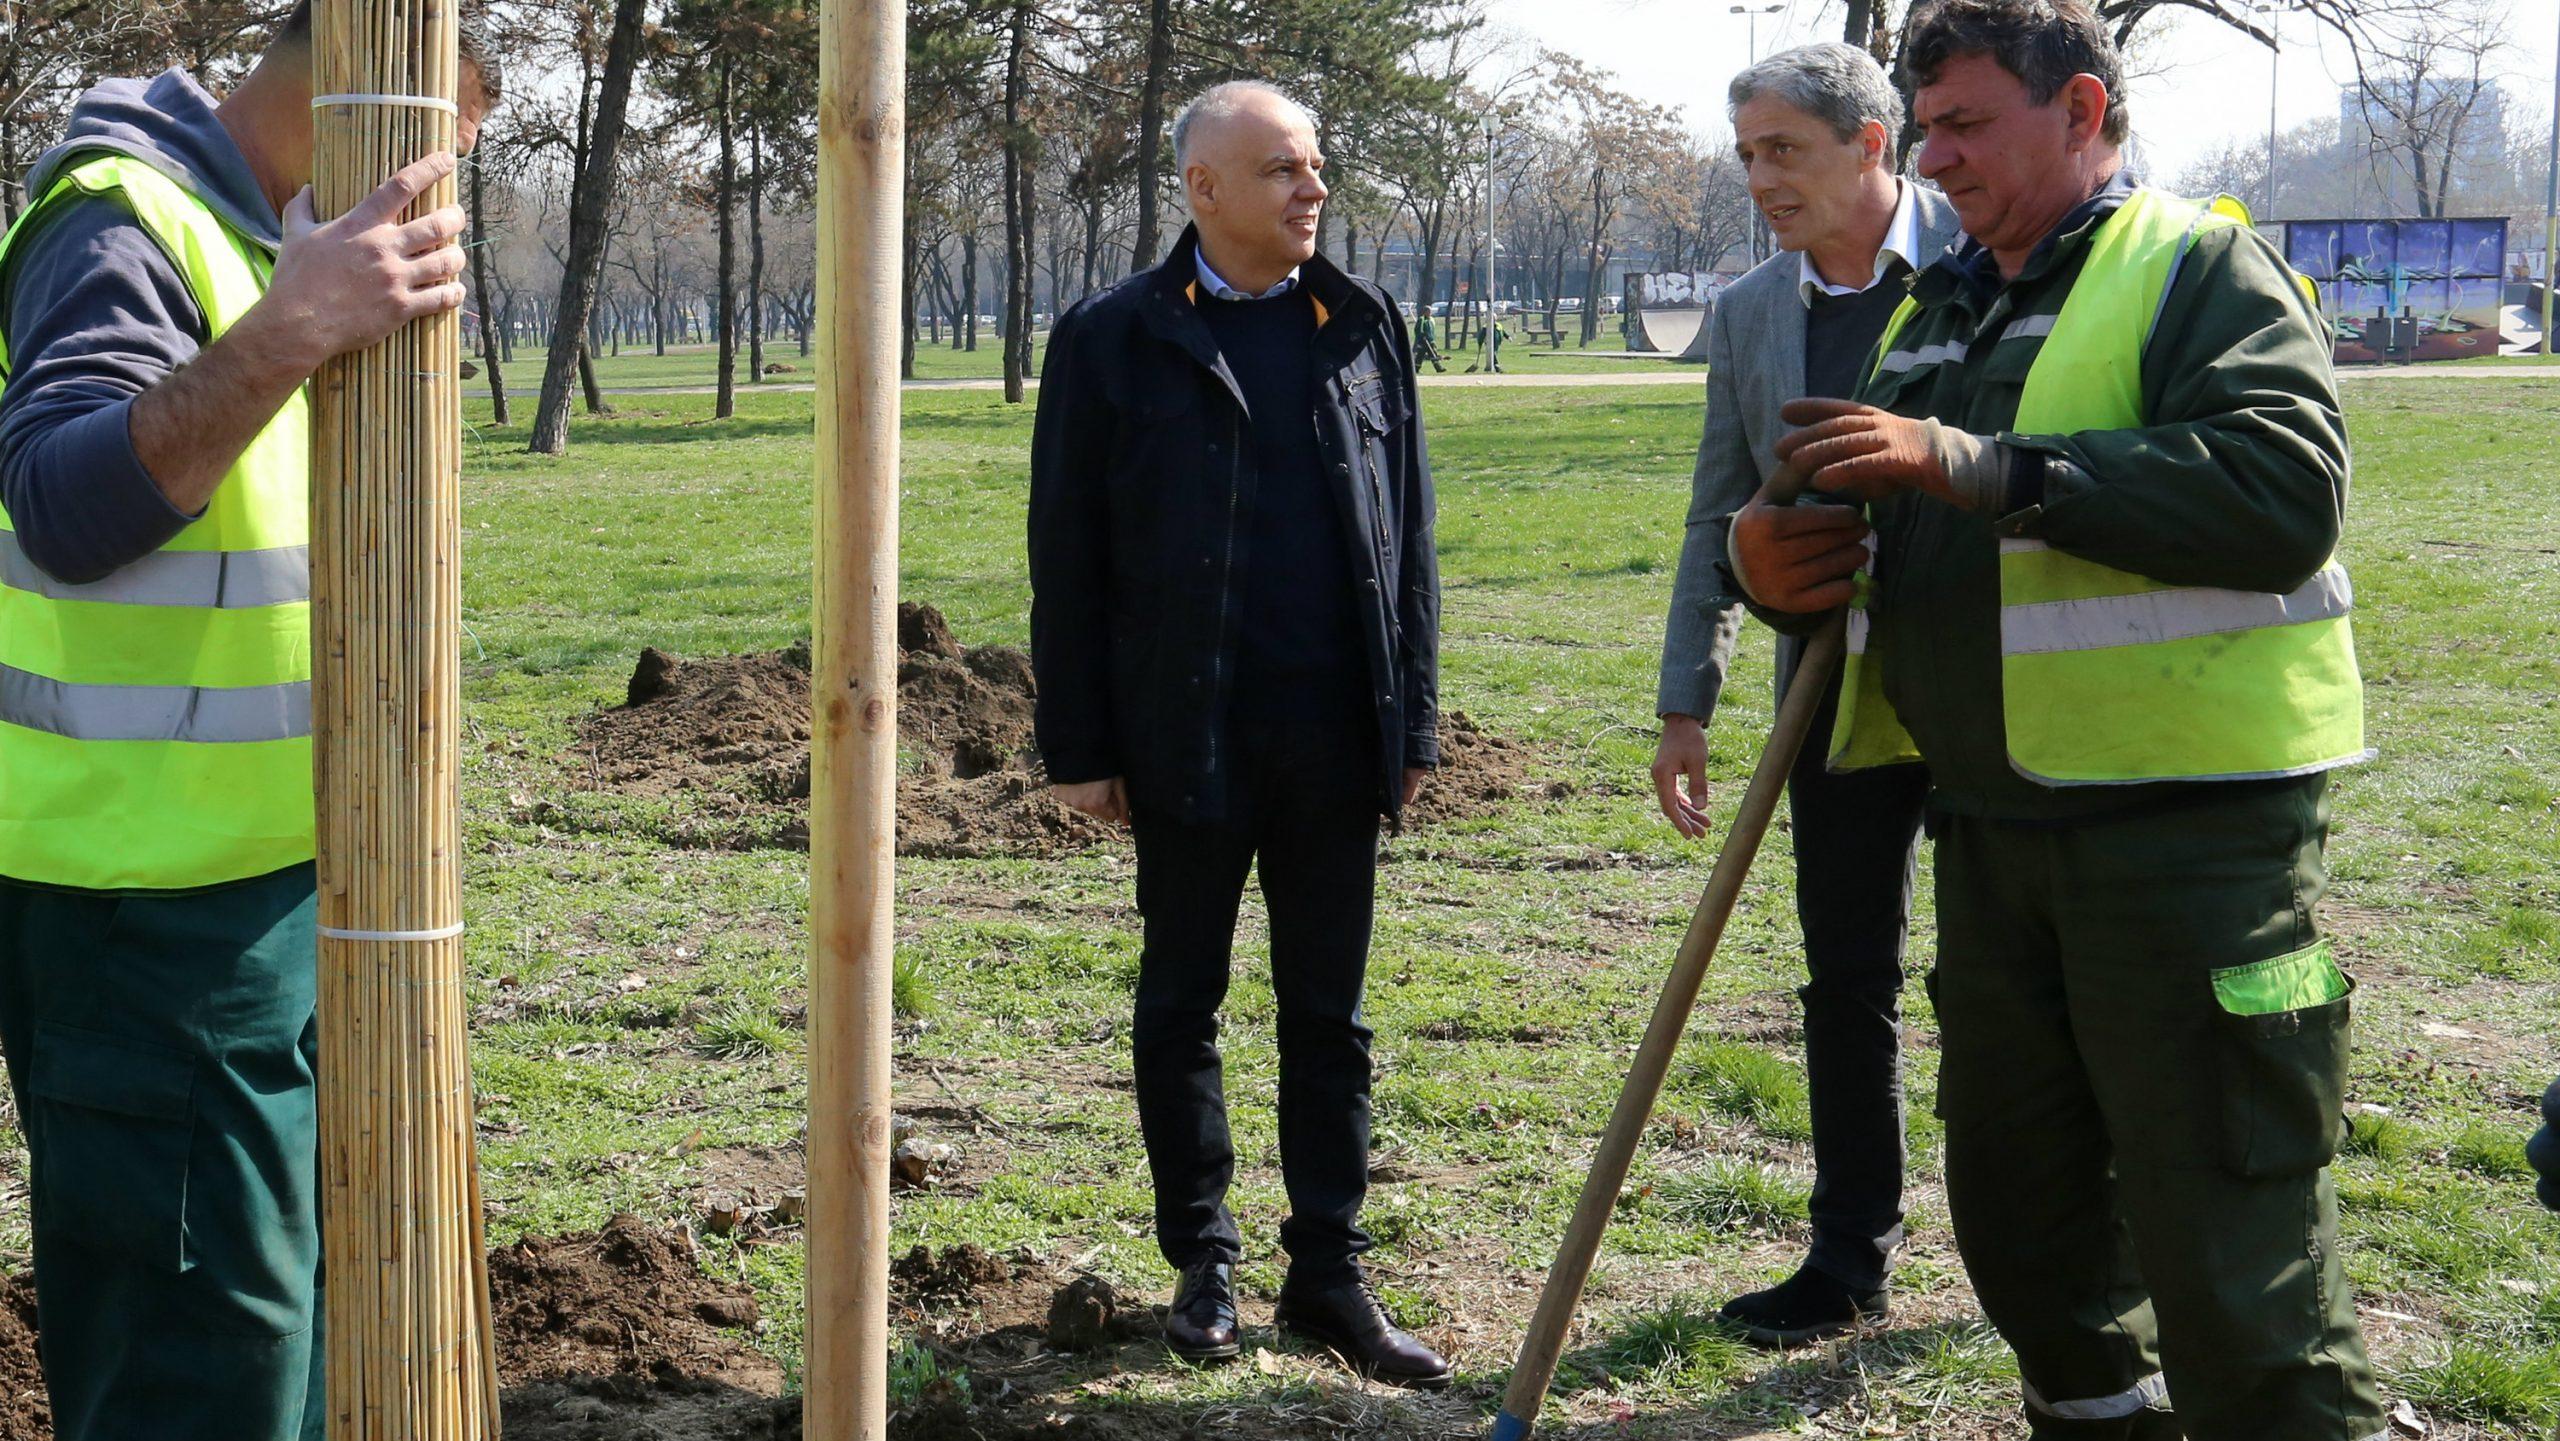 Gradonačelnik: Do 2025. godine 25 odsto zelenih površina u urbanom delu Beograda 1